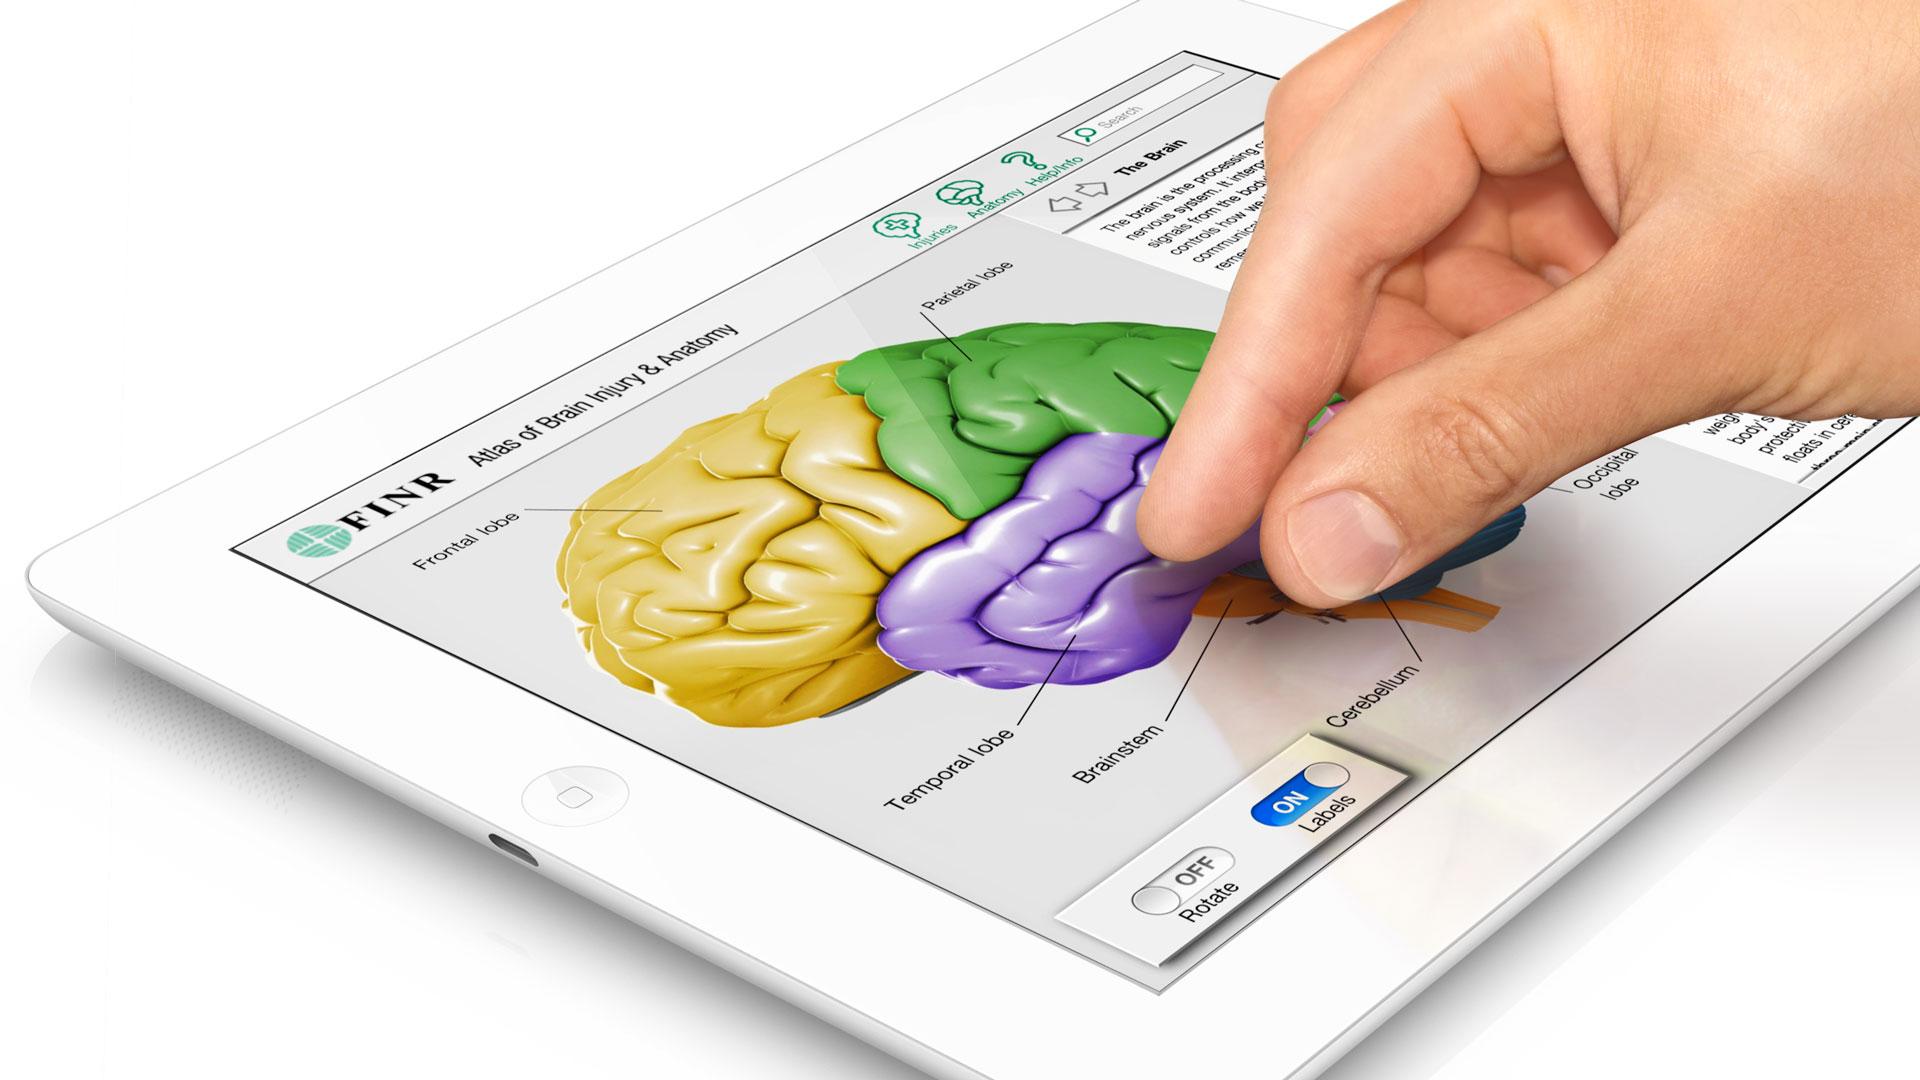 axs-studio-medical-ipad-app-neuroanatomy-atlas-interactive-011